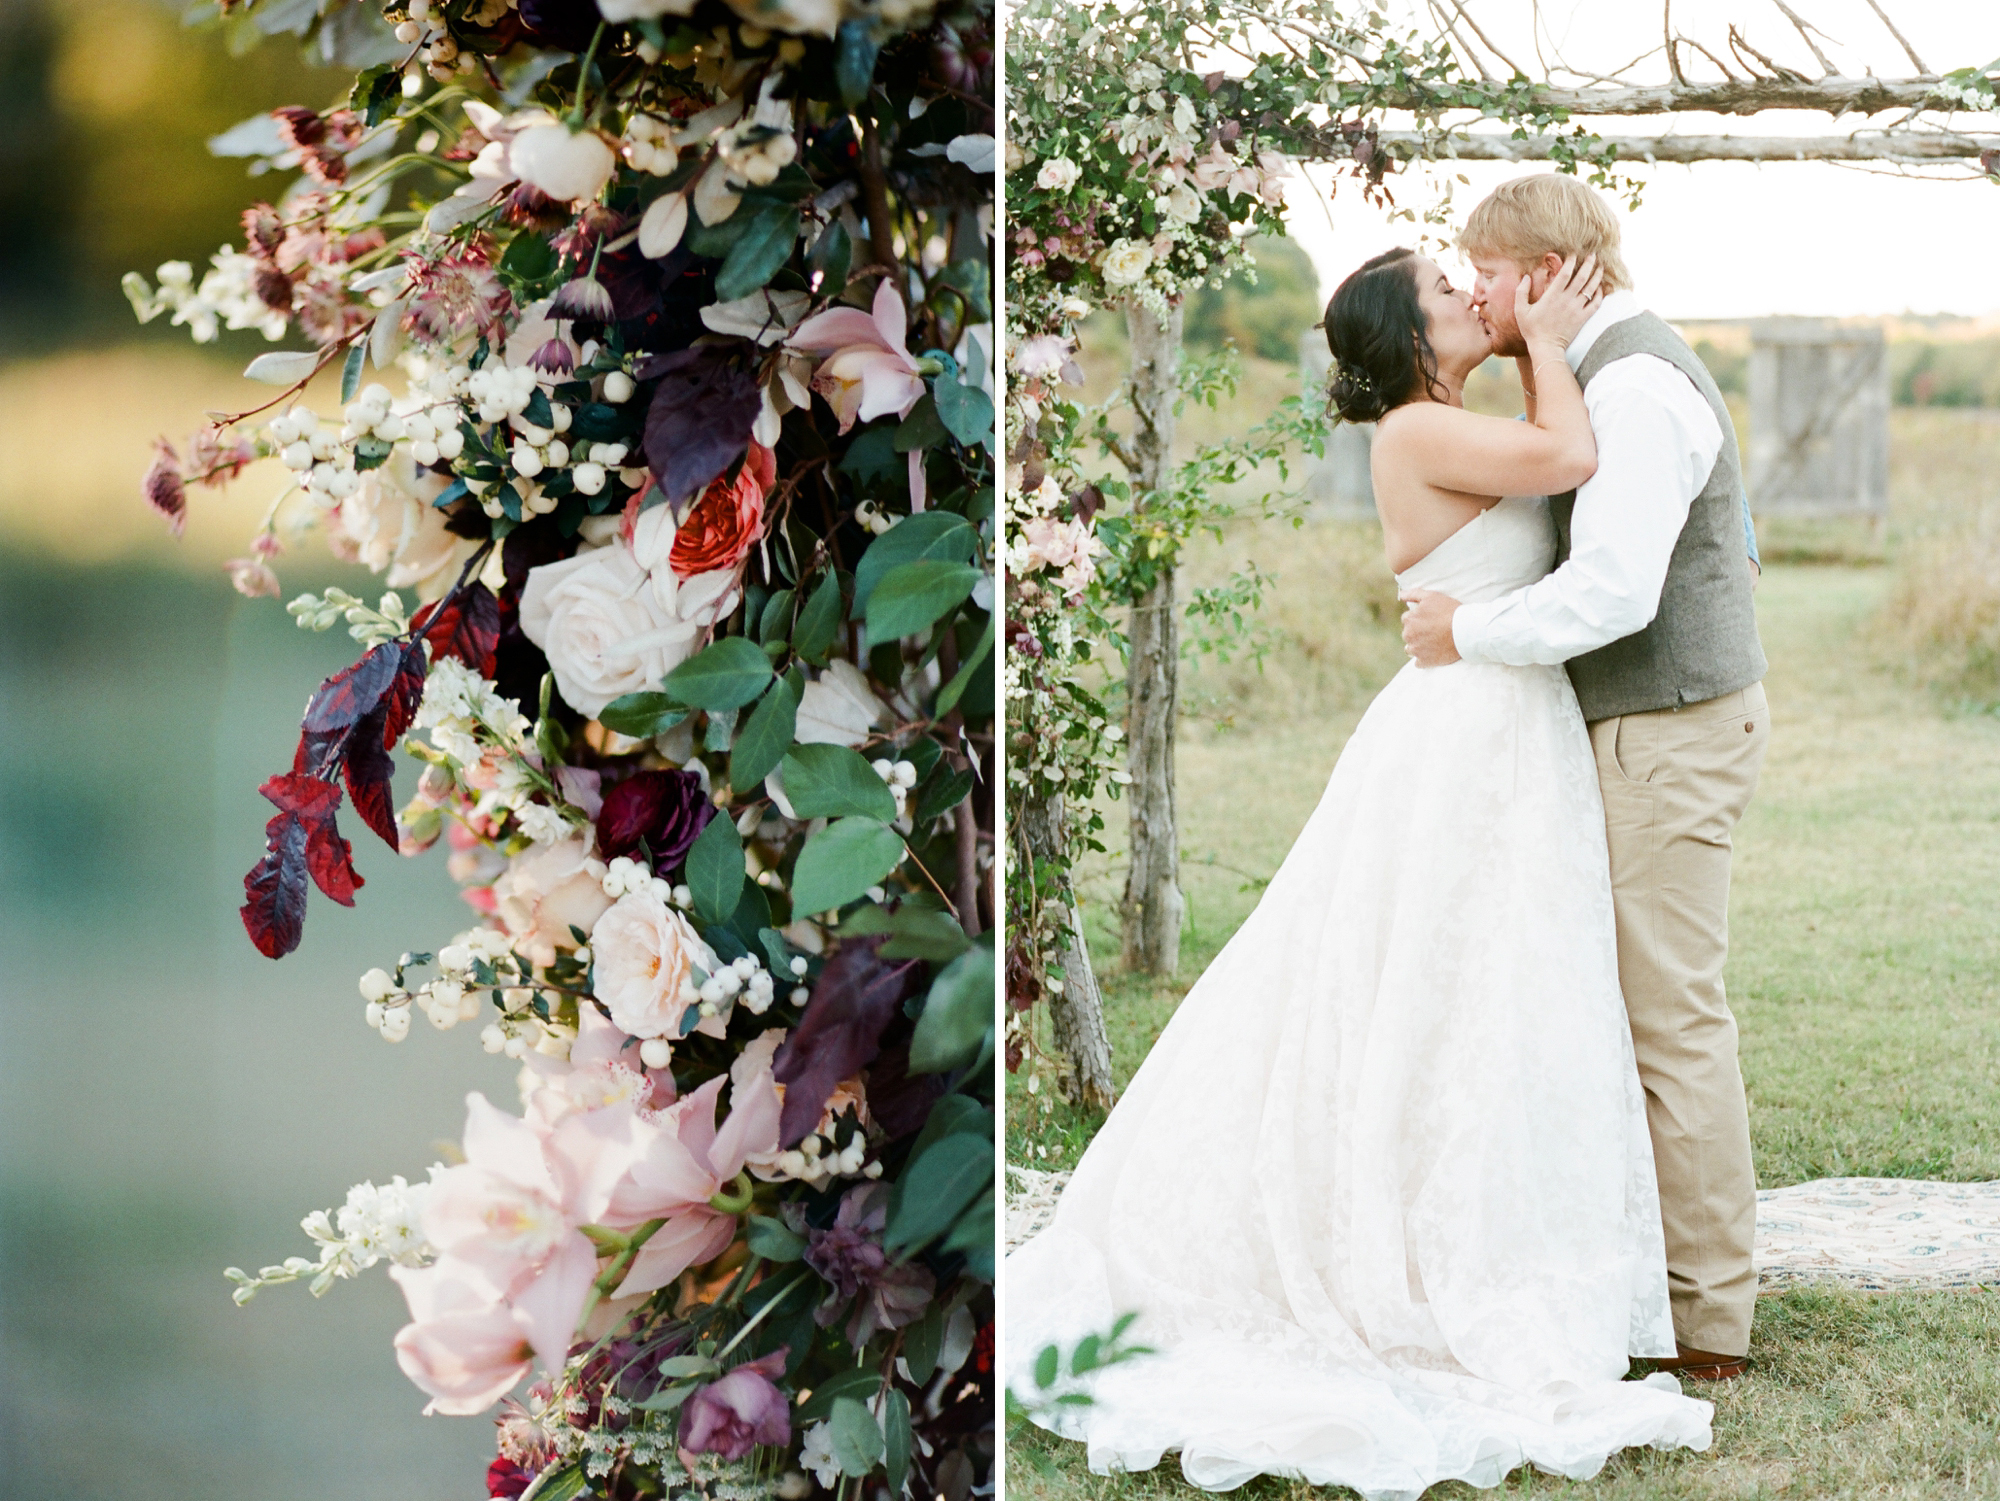 southern-weddings-film-photographer_0041.jpg